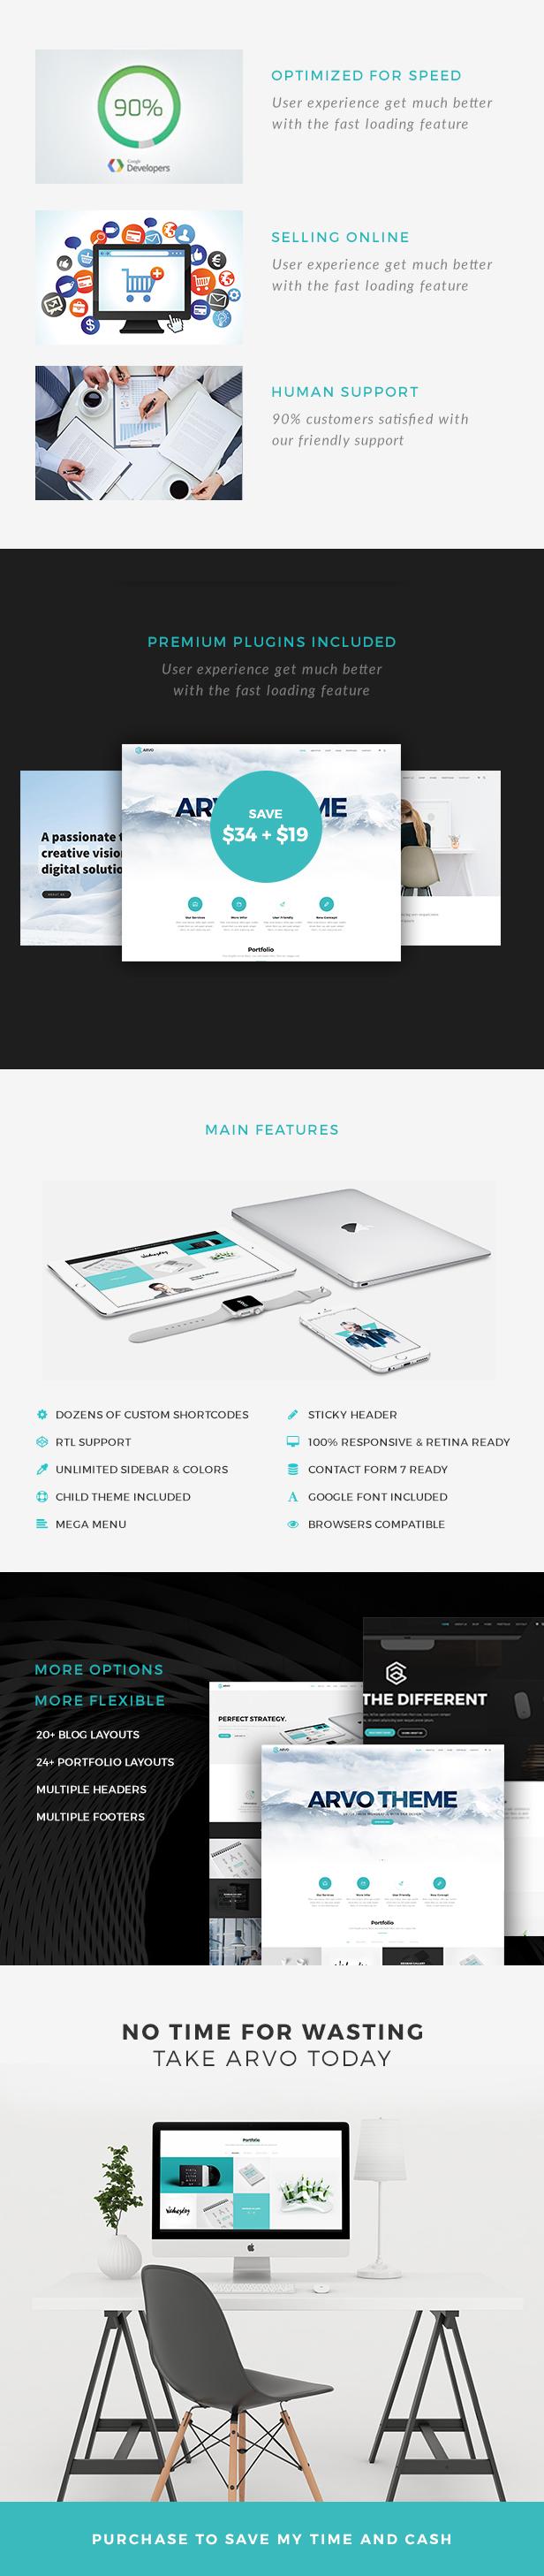 Arvo - A Clever & Flexible Multipurpose WordPress Theme - 11